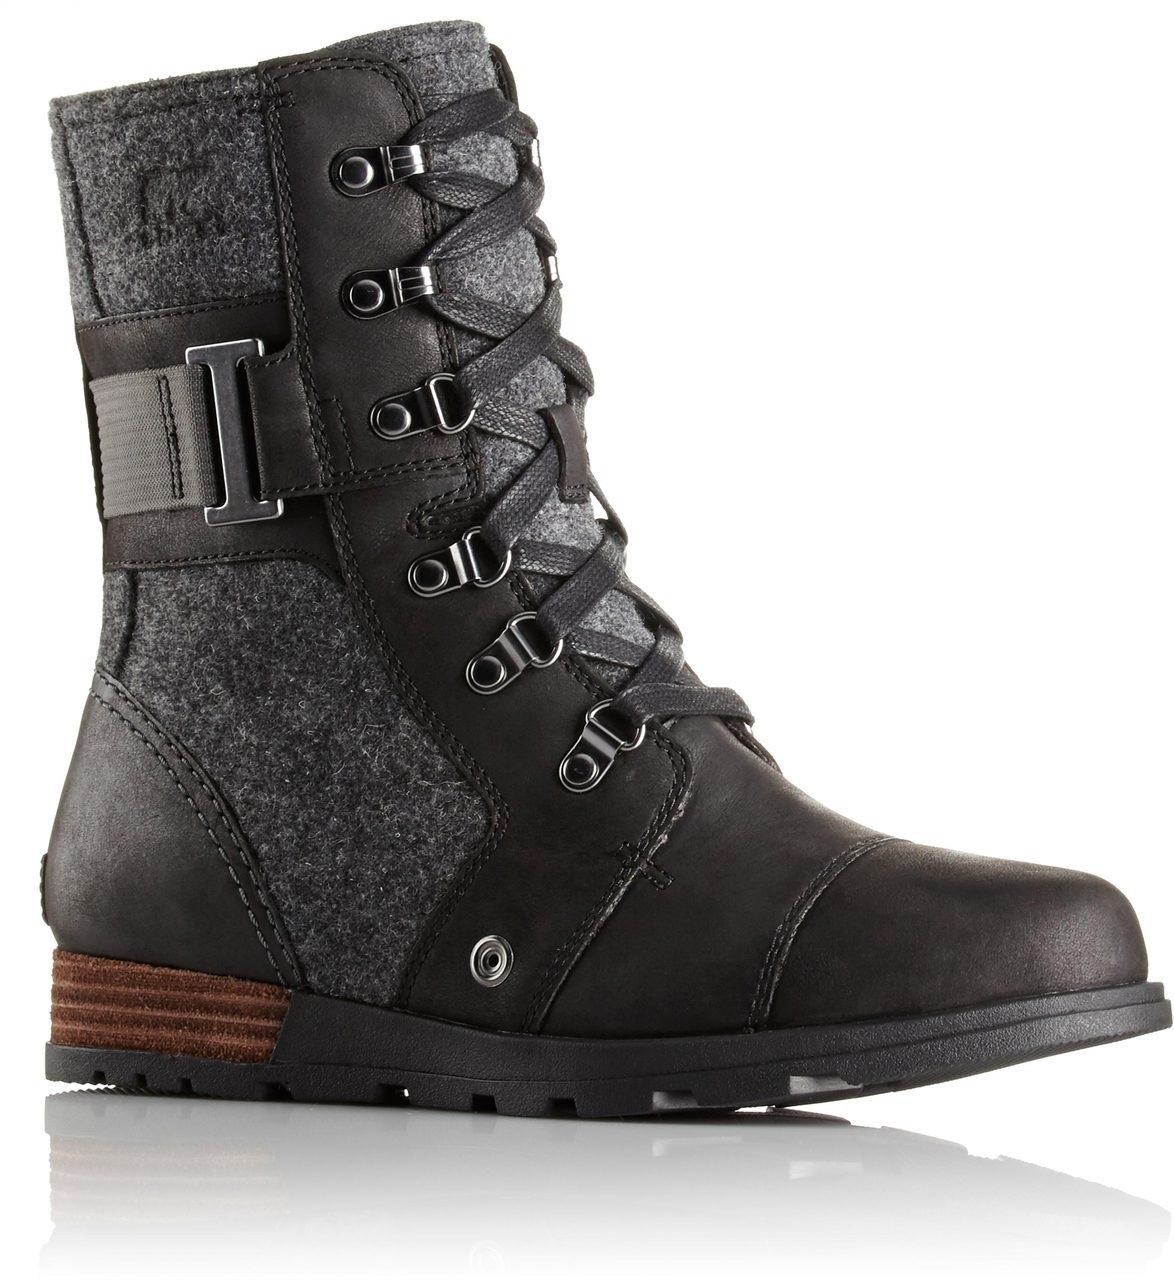 1d531955f947 Top 5 Sorel Boots for Fall - Englin s Fine Footwear